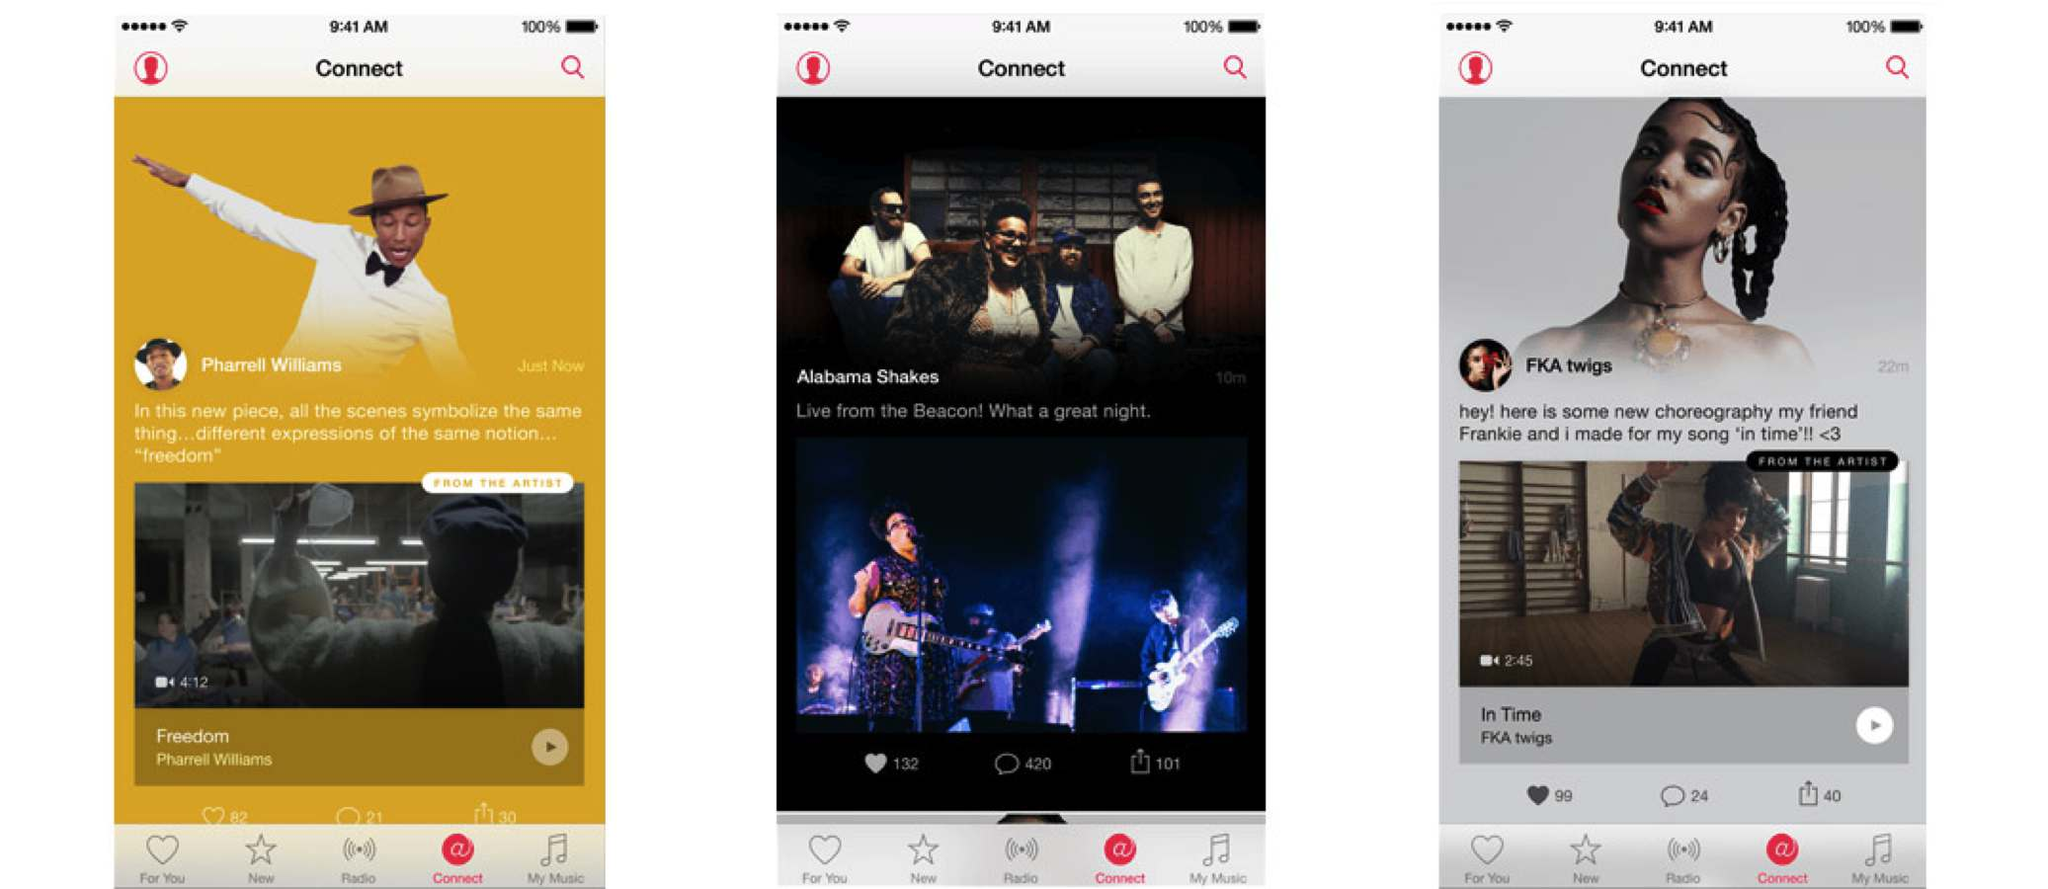 apple music connect screenshots